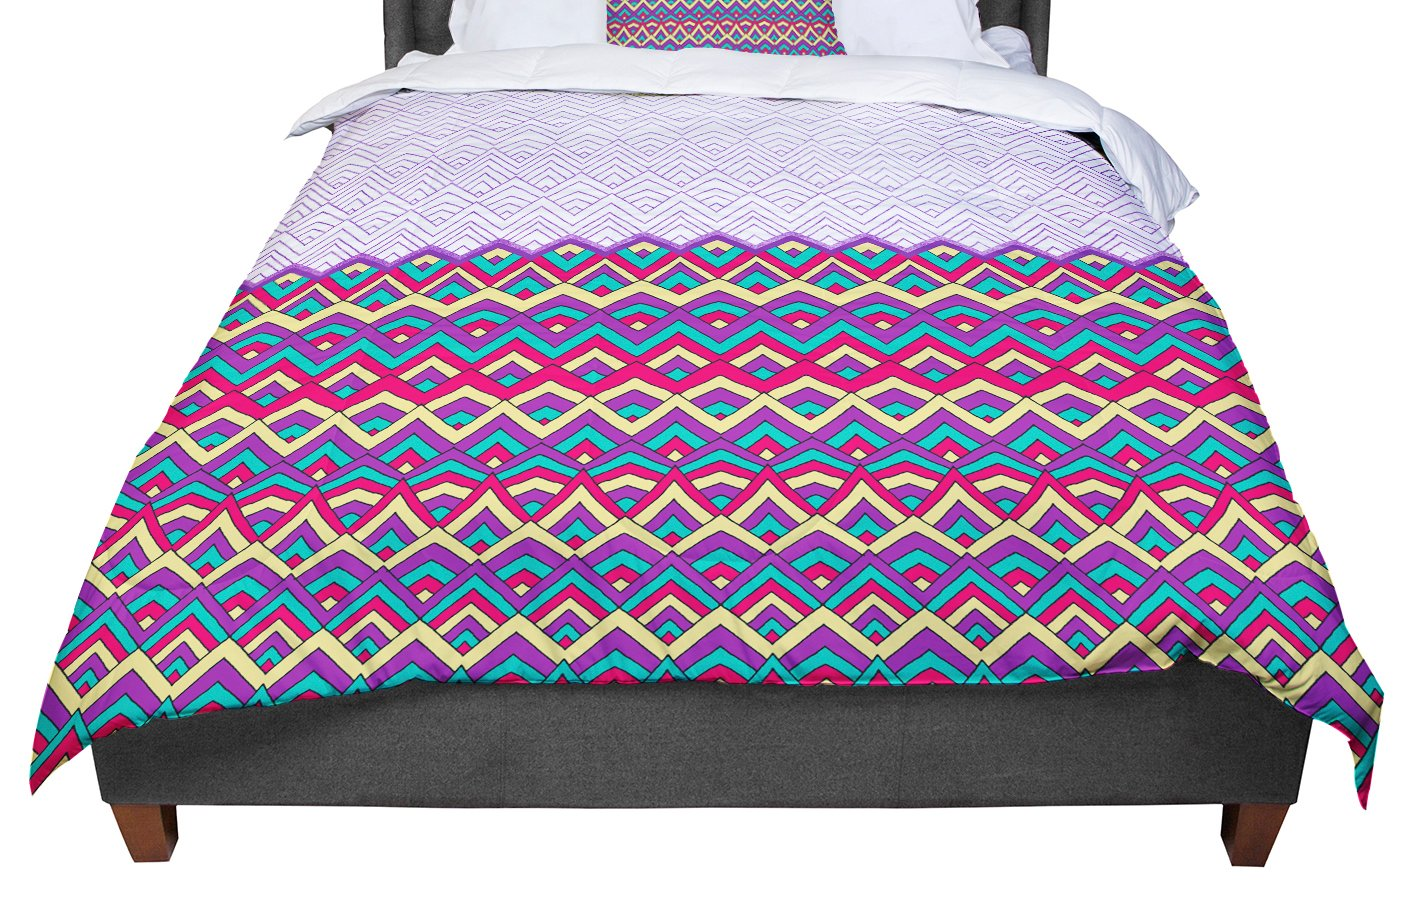 KESS InHouse Pom Graphic Design Horizons II King 104 X 88 Cal King Comforter